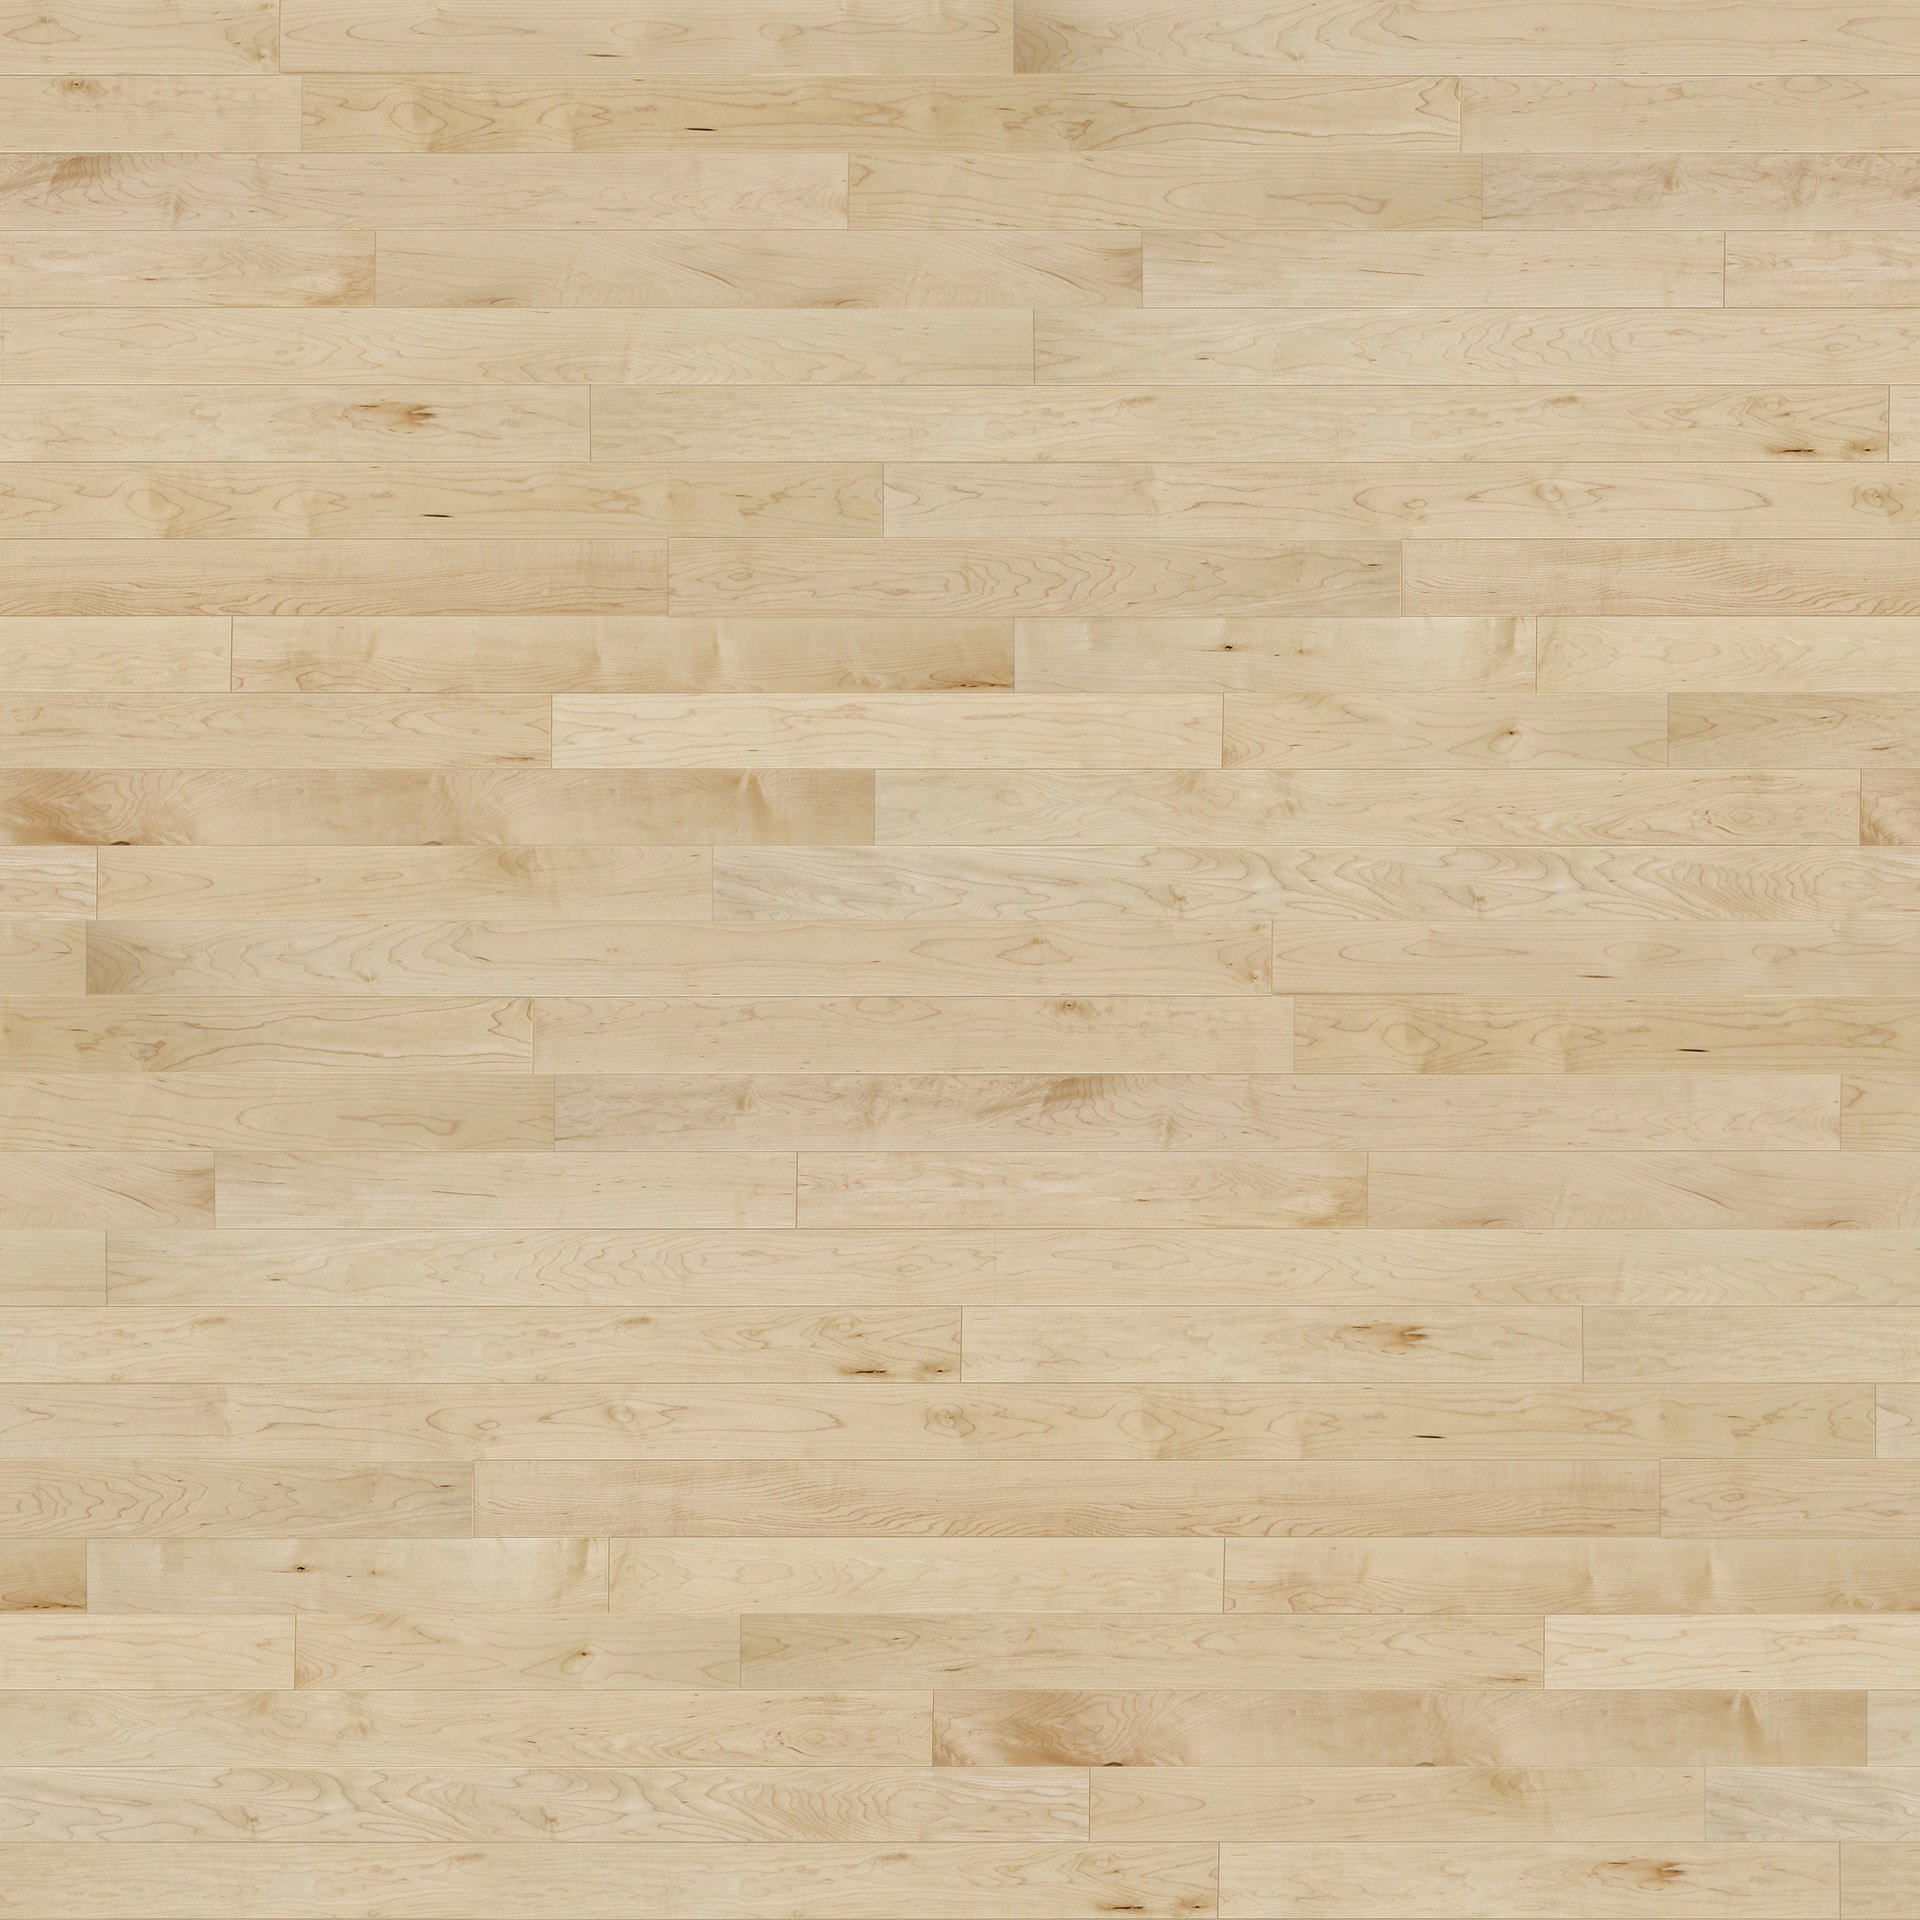 Natural Maple Entranceway By Mullican Flooring Www: Appalachian Signature Hard Maple